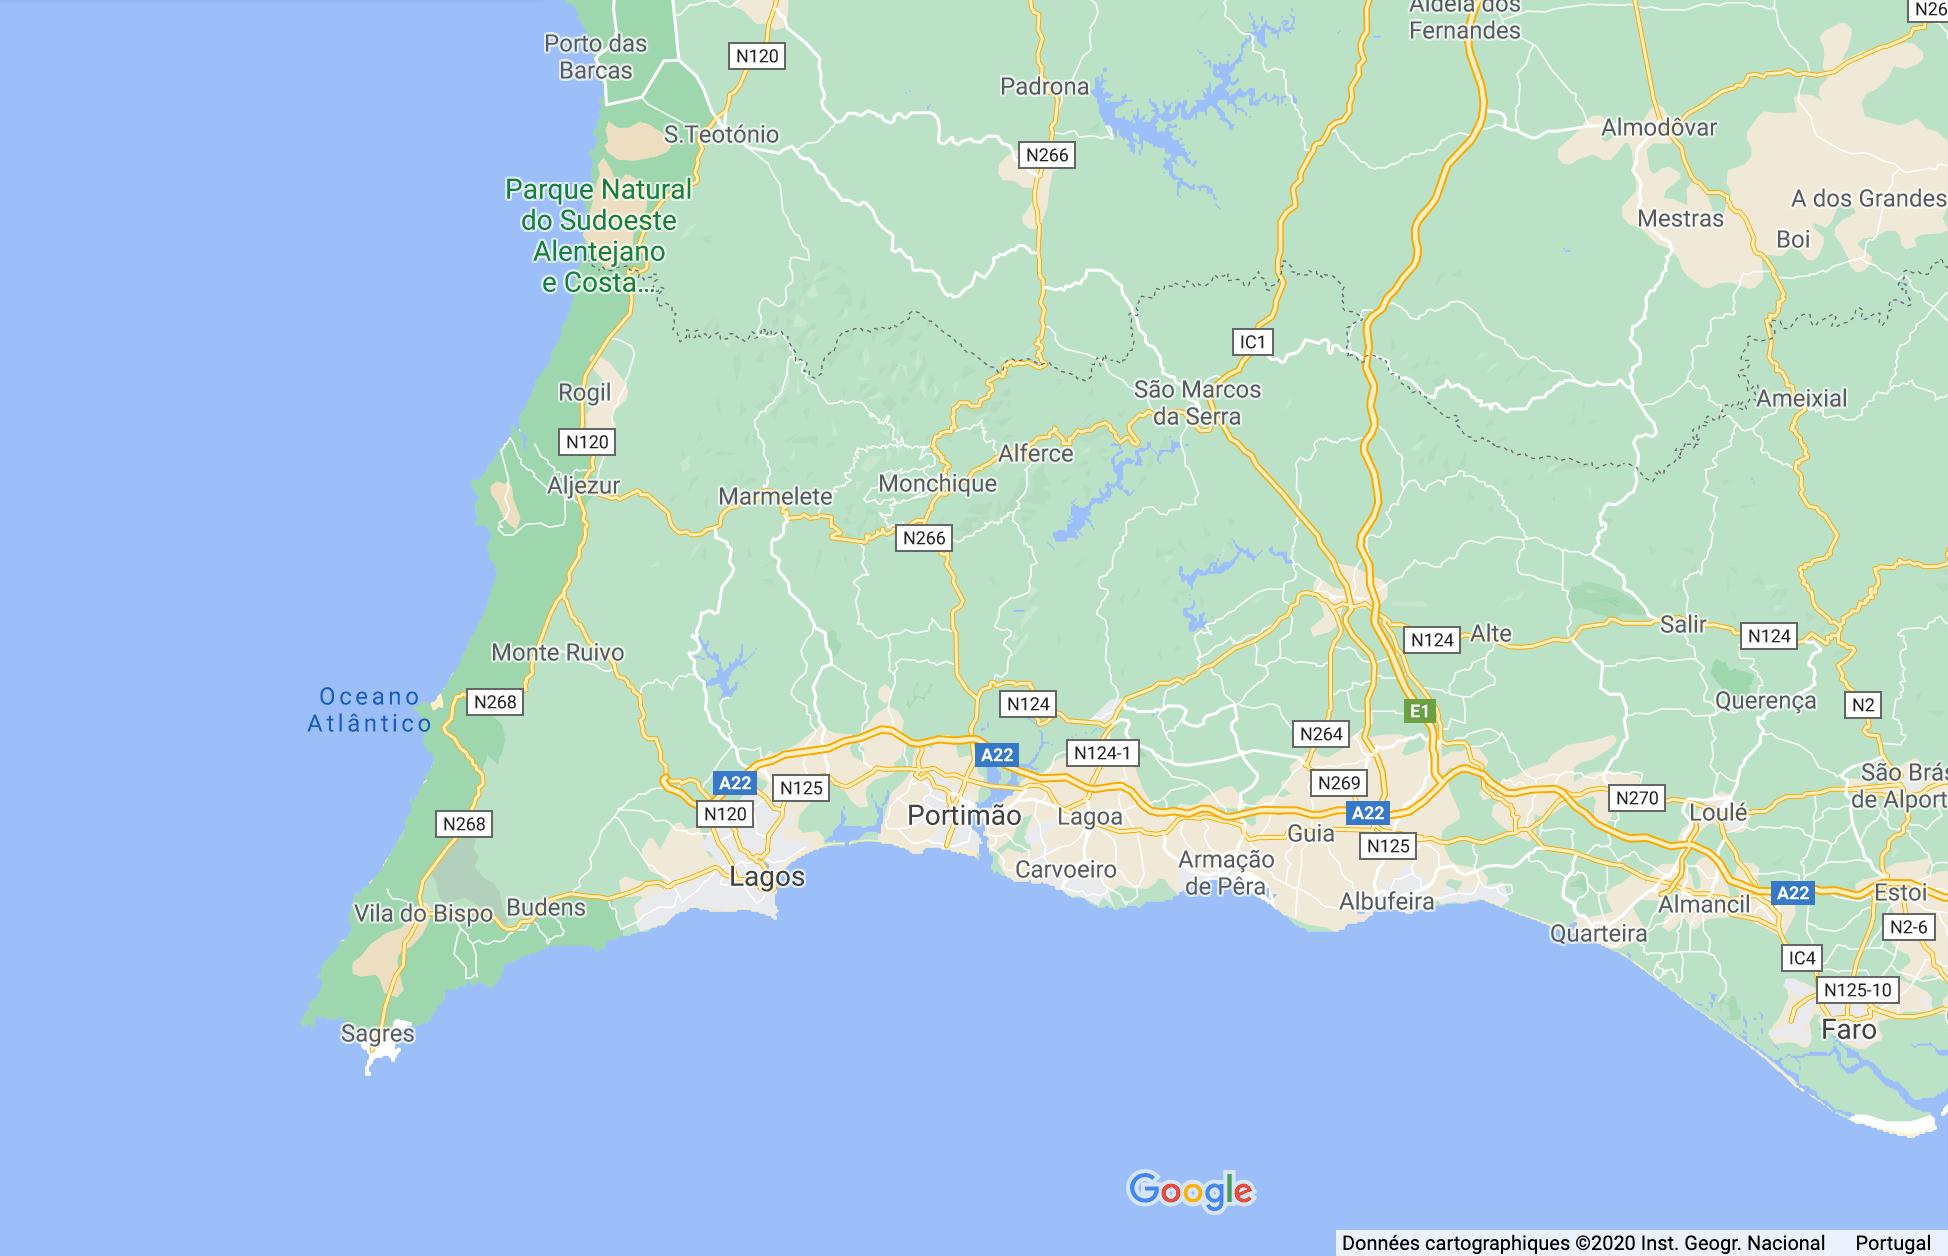 carte d'un road trip surf en Algarve